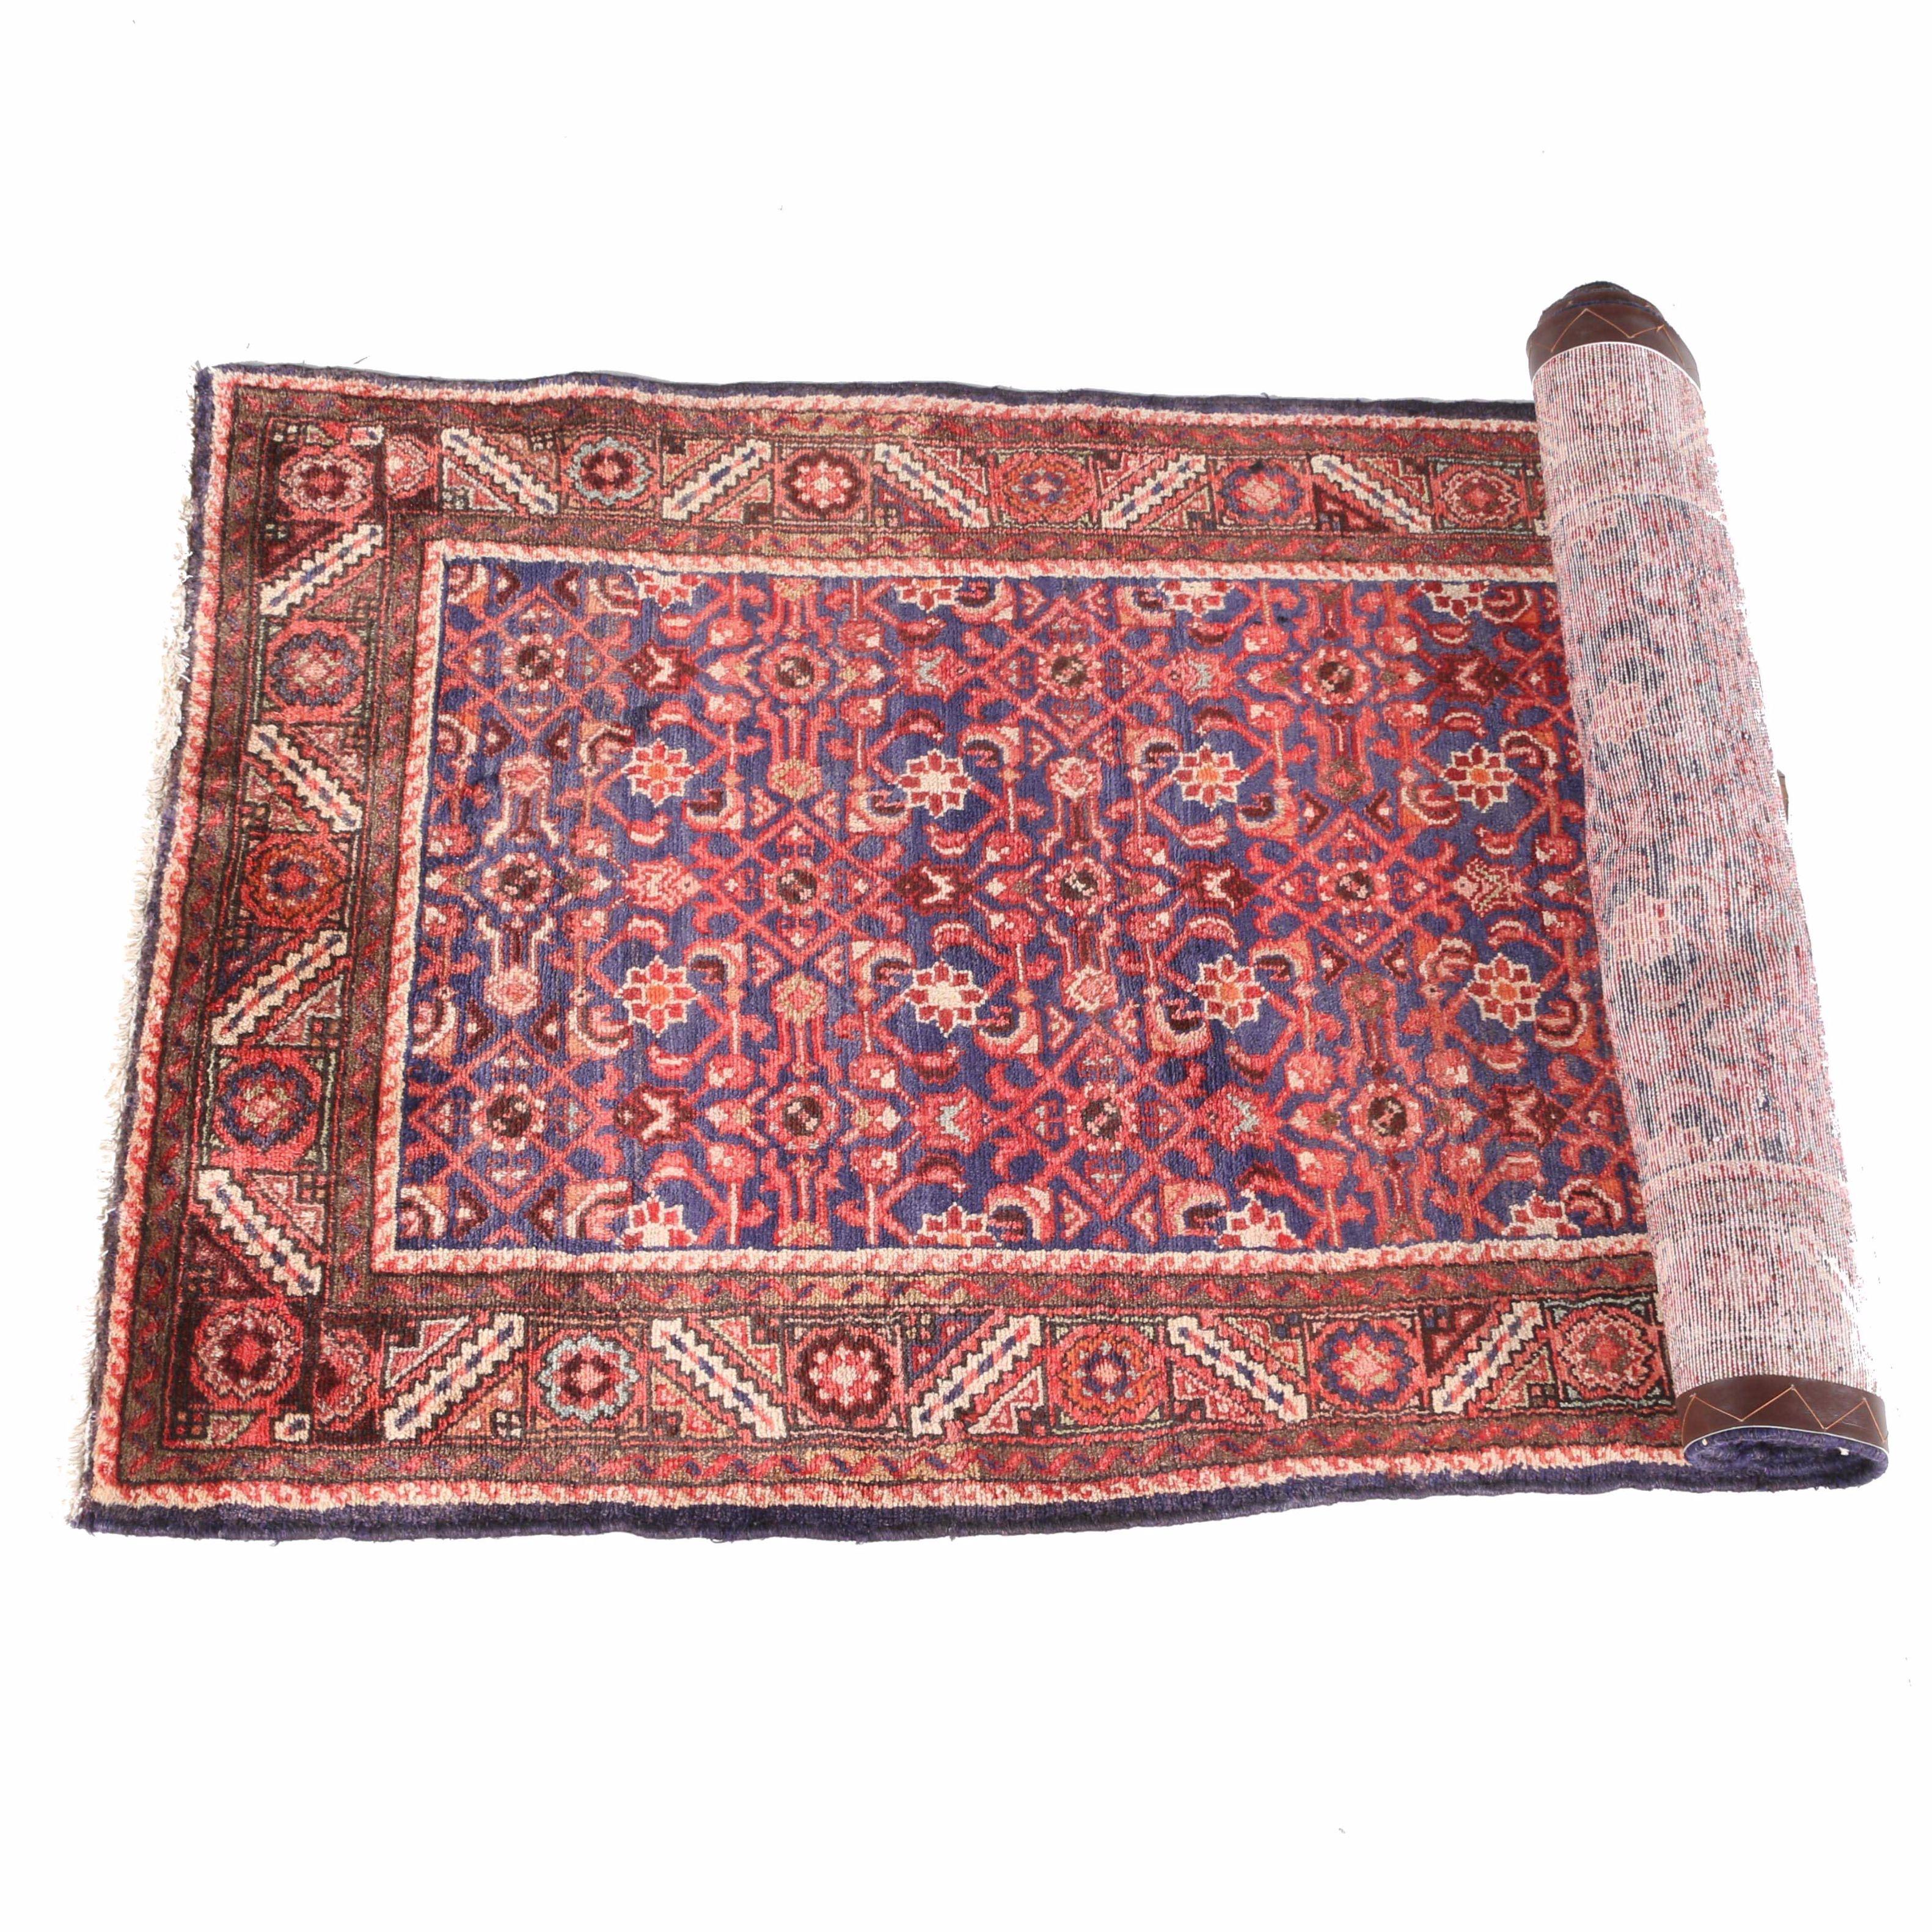 Semi-Antique Hand-Knotted Kurdish Carpet Runner